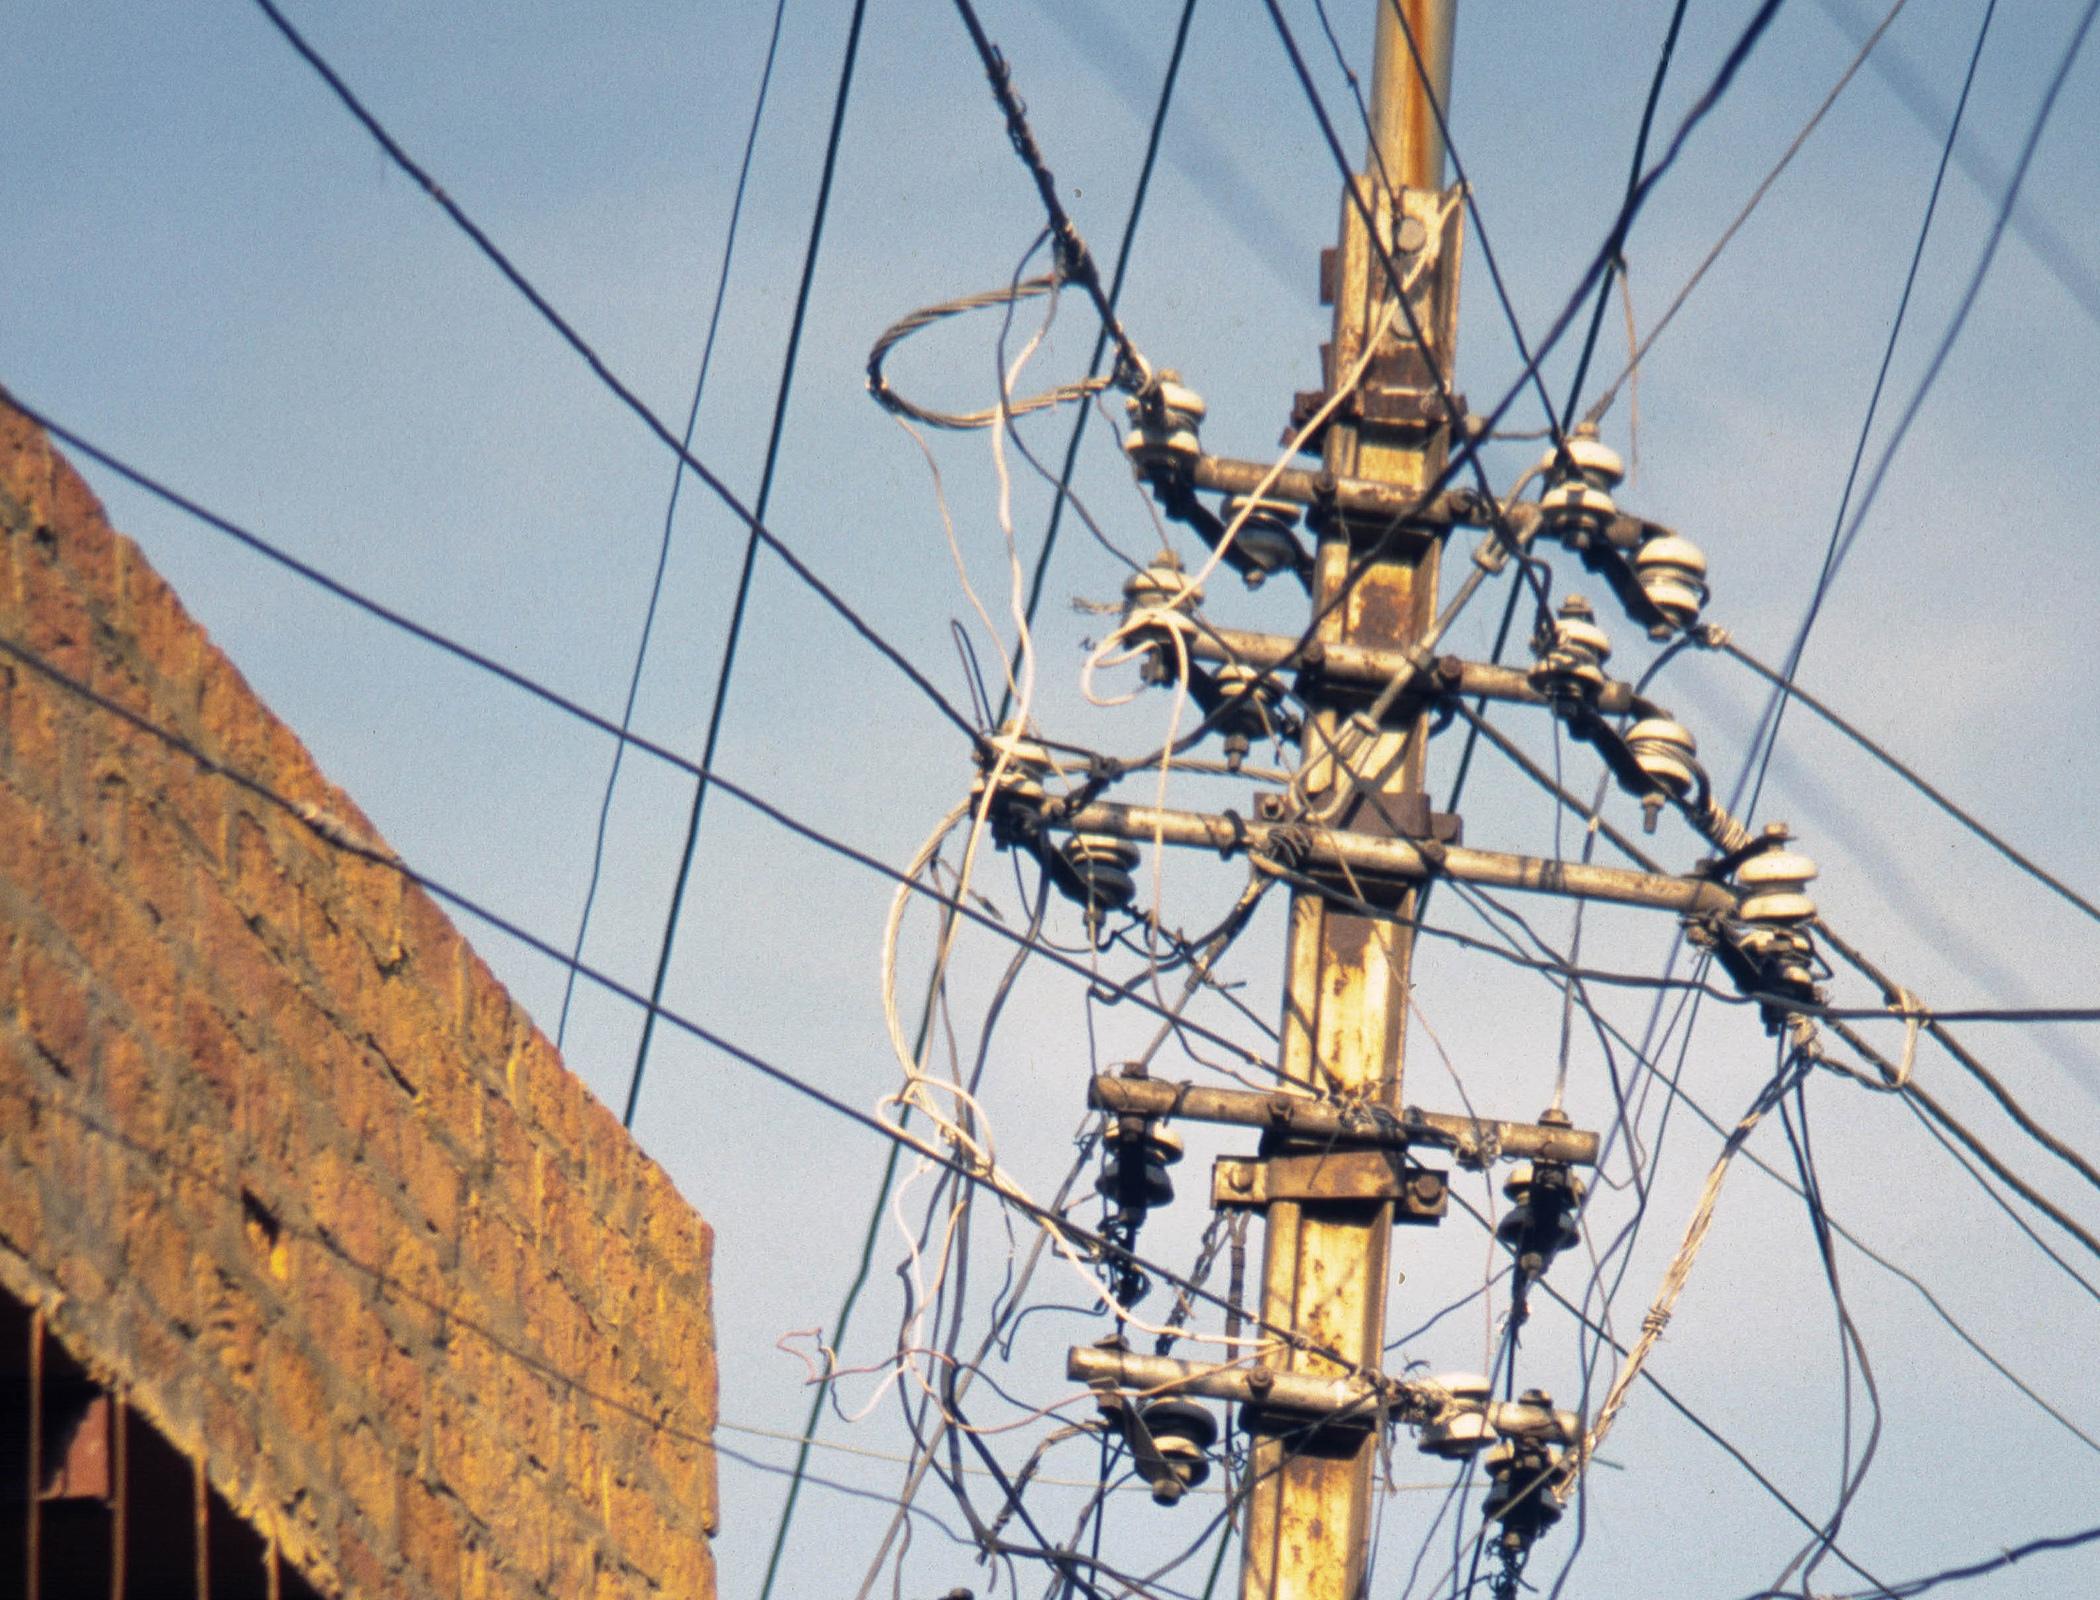 Electrical Wiring In India - Merzie.net